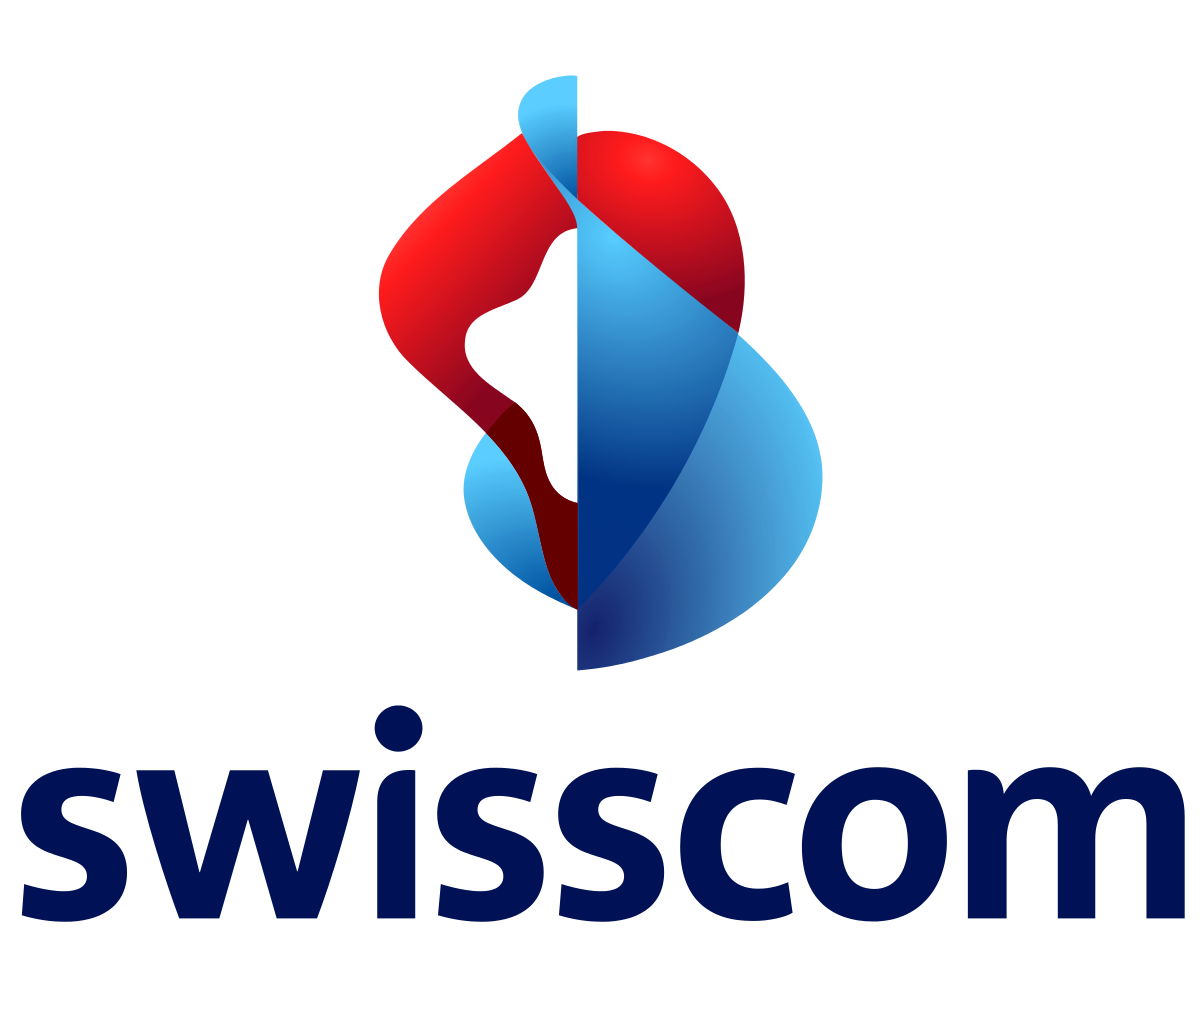 Swisscom-logo-and-wordmark